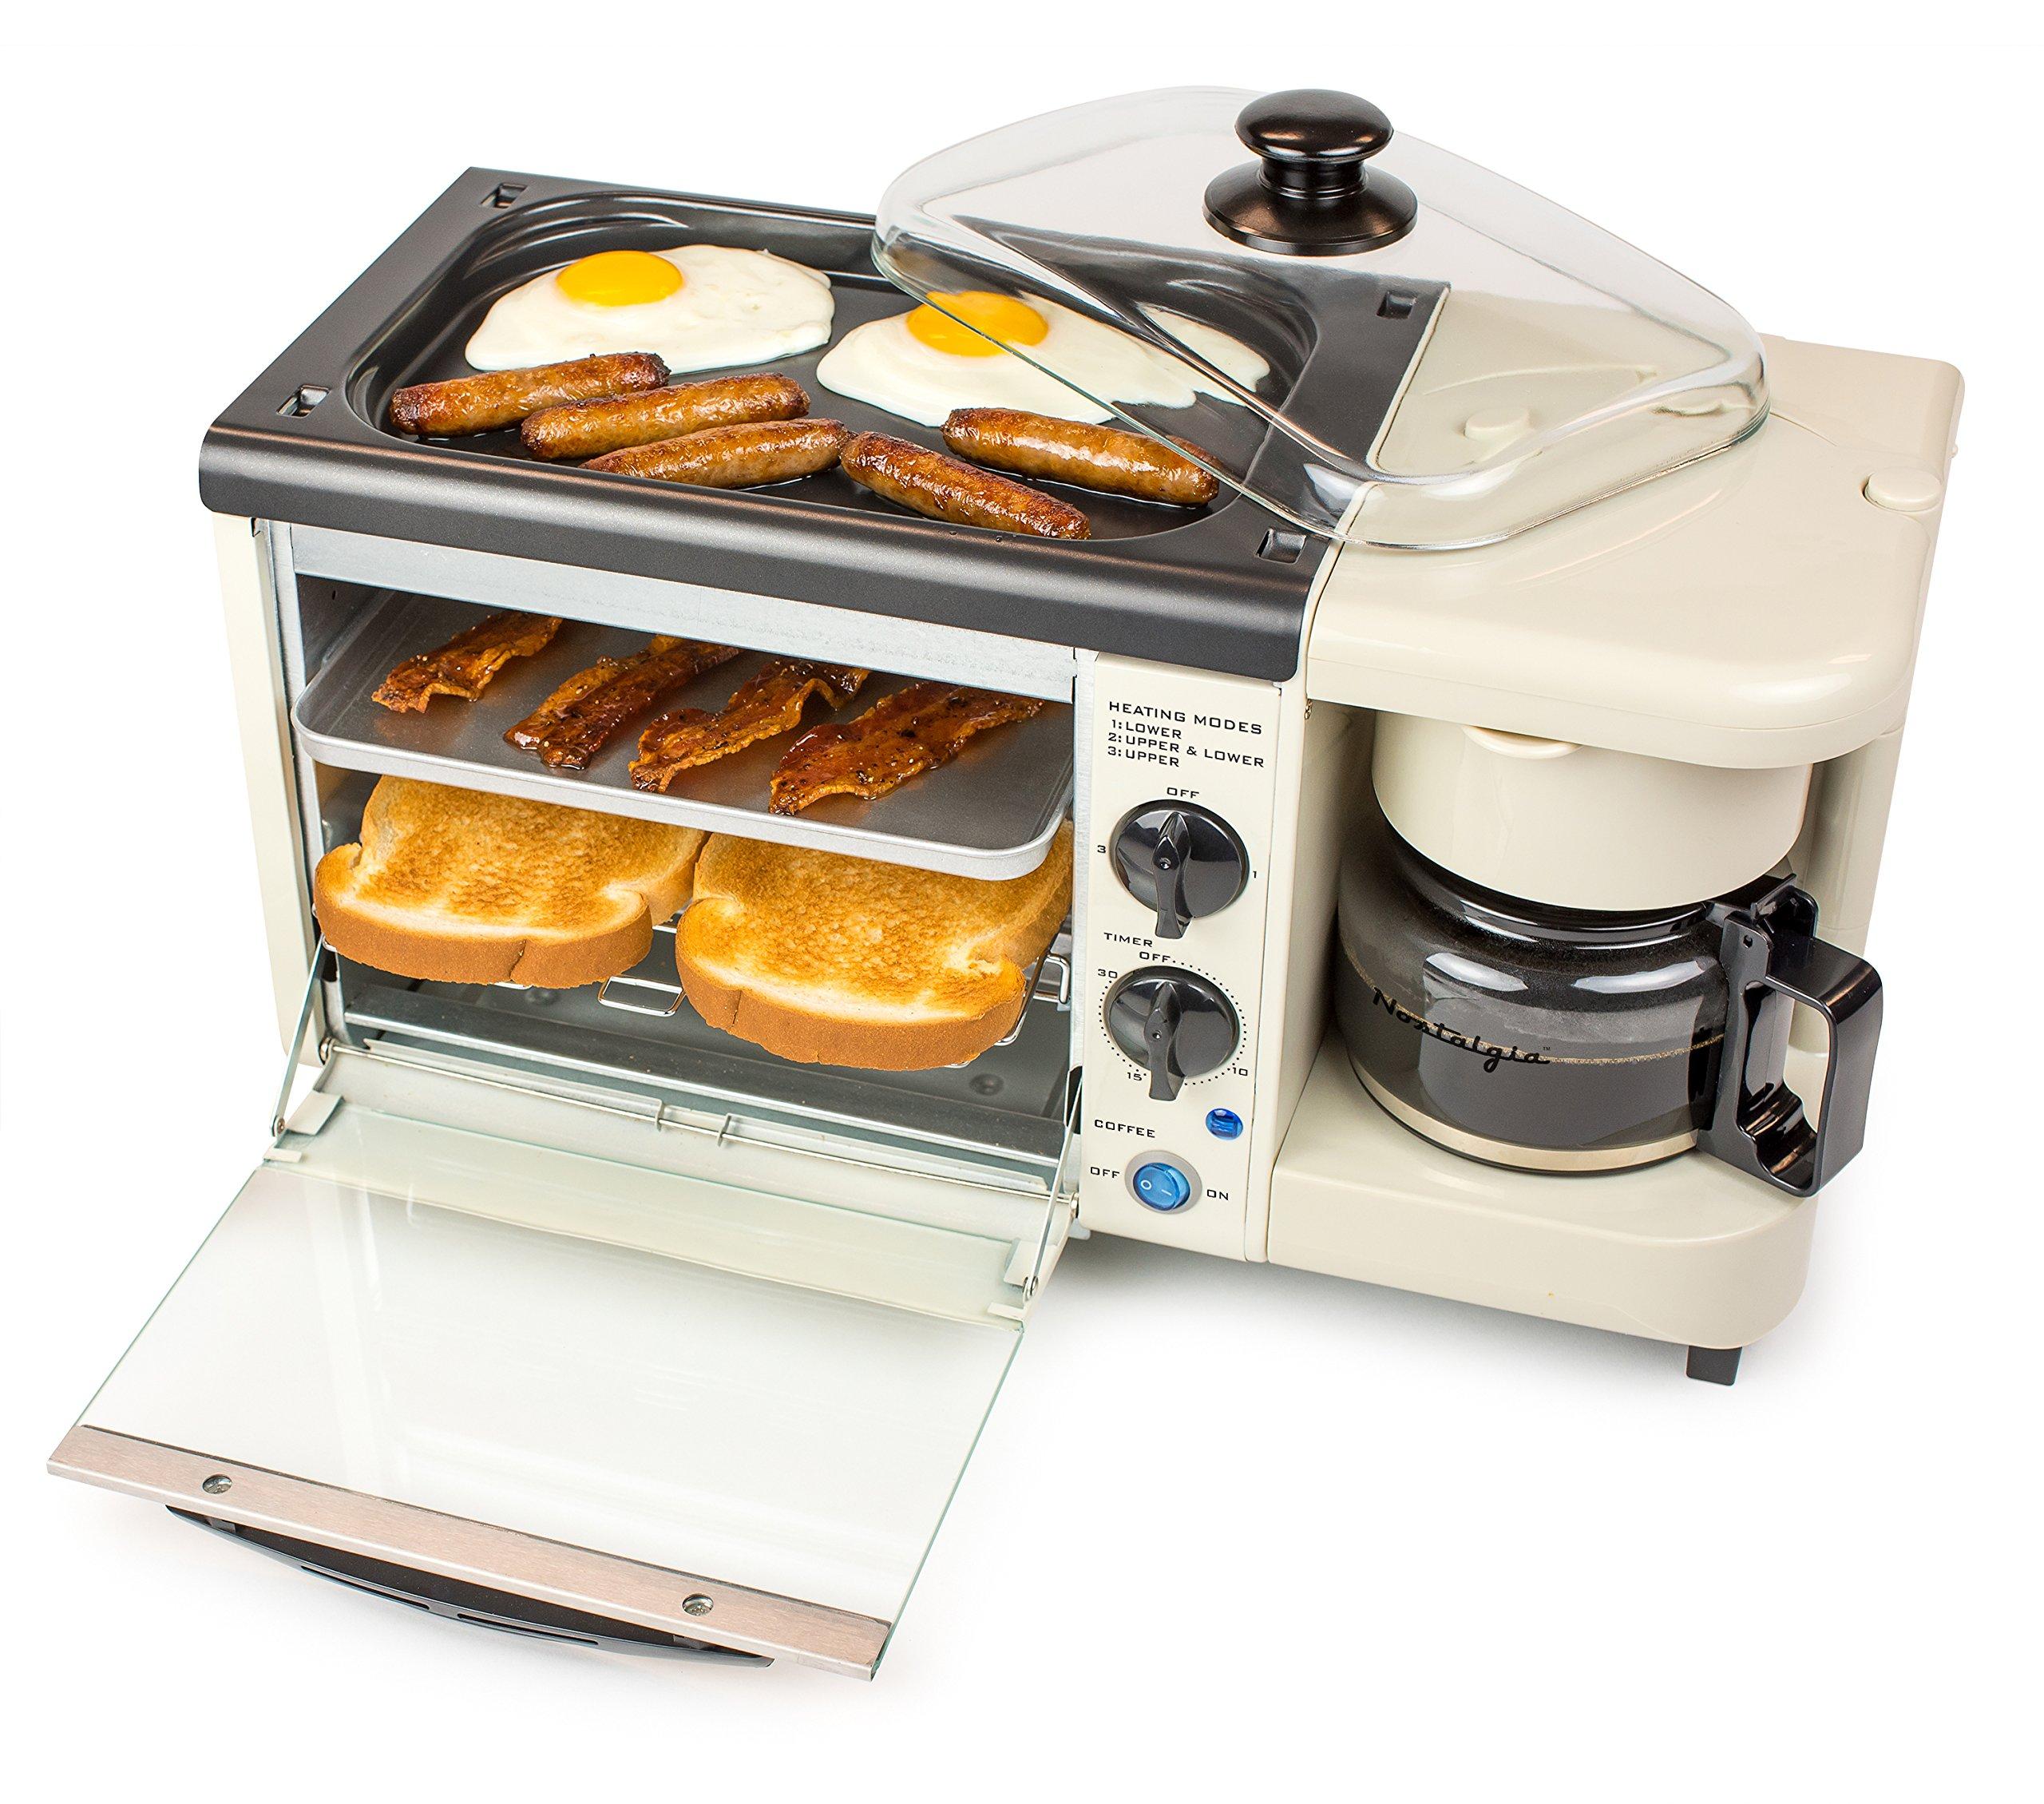 Nostalgia Bset100Bc 3-In-1 Toaster Ovens, 2 Slice, Bisque by NOSTALGIA